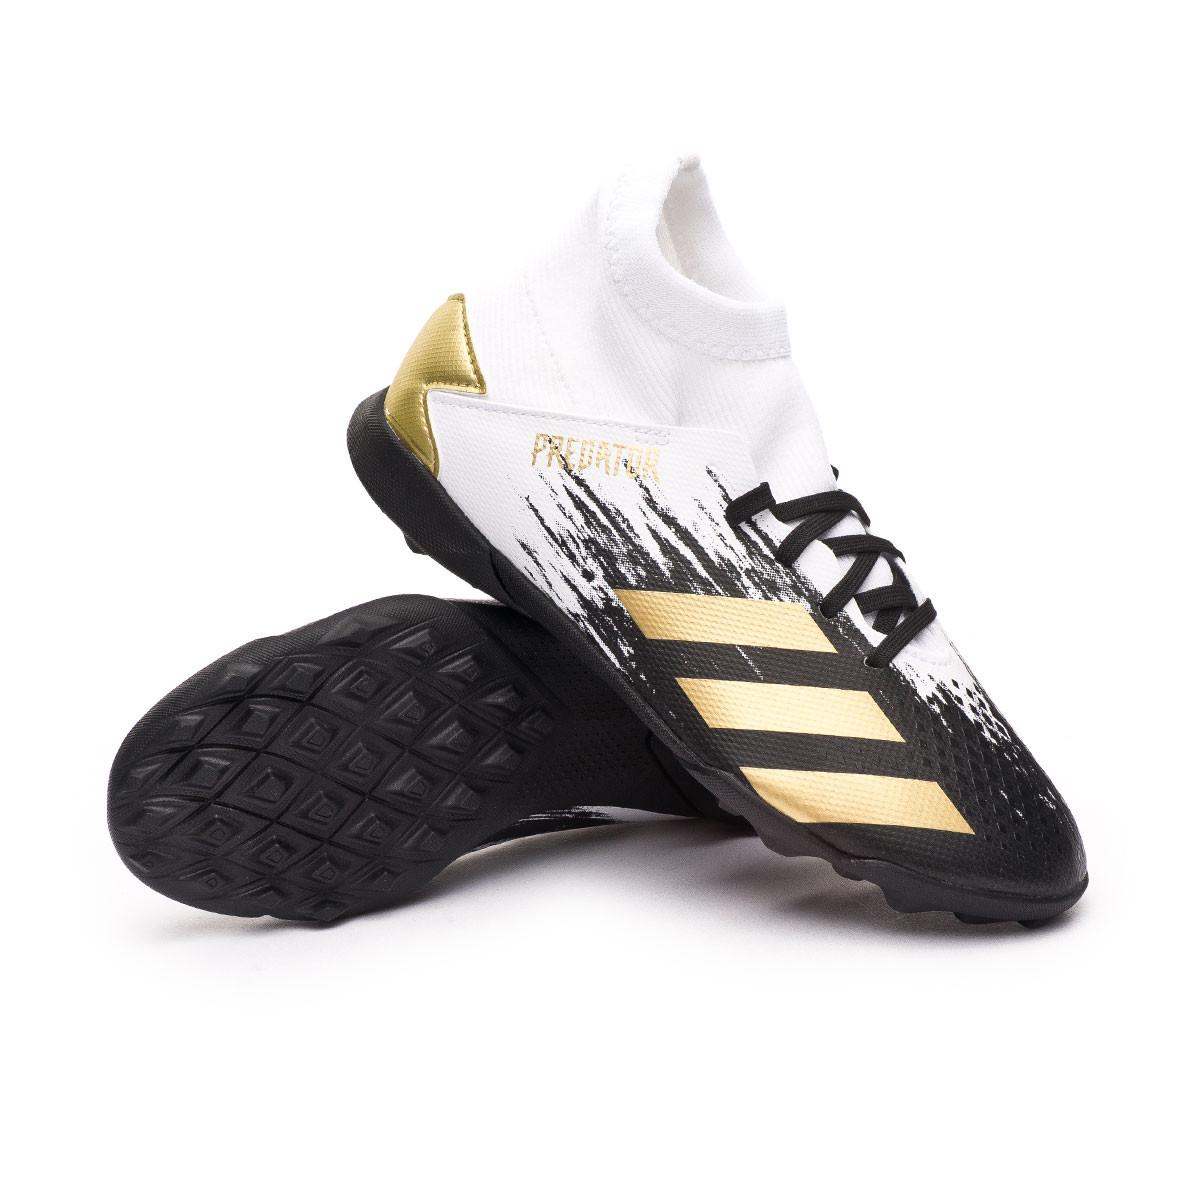 Football Boots adidas Predator 20.3